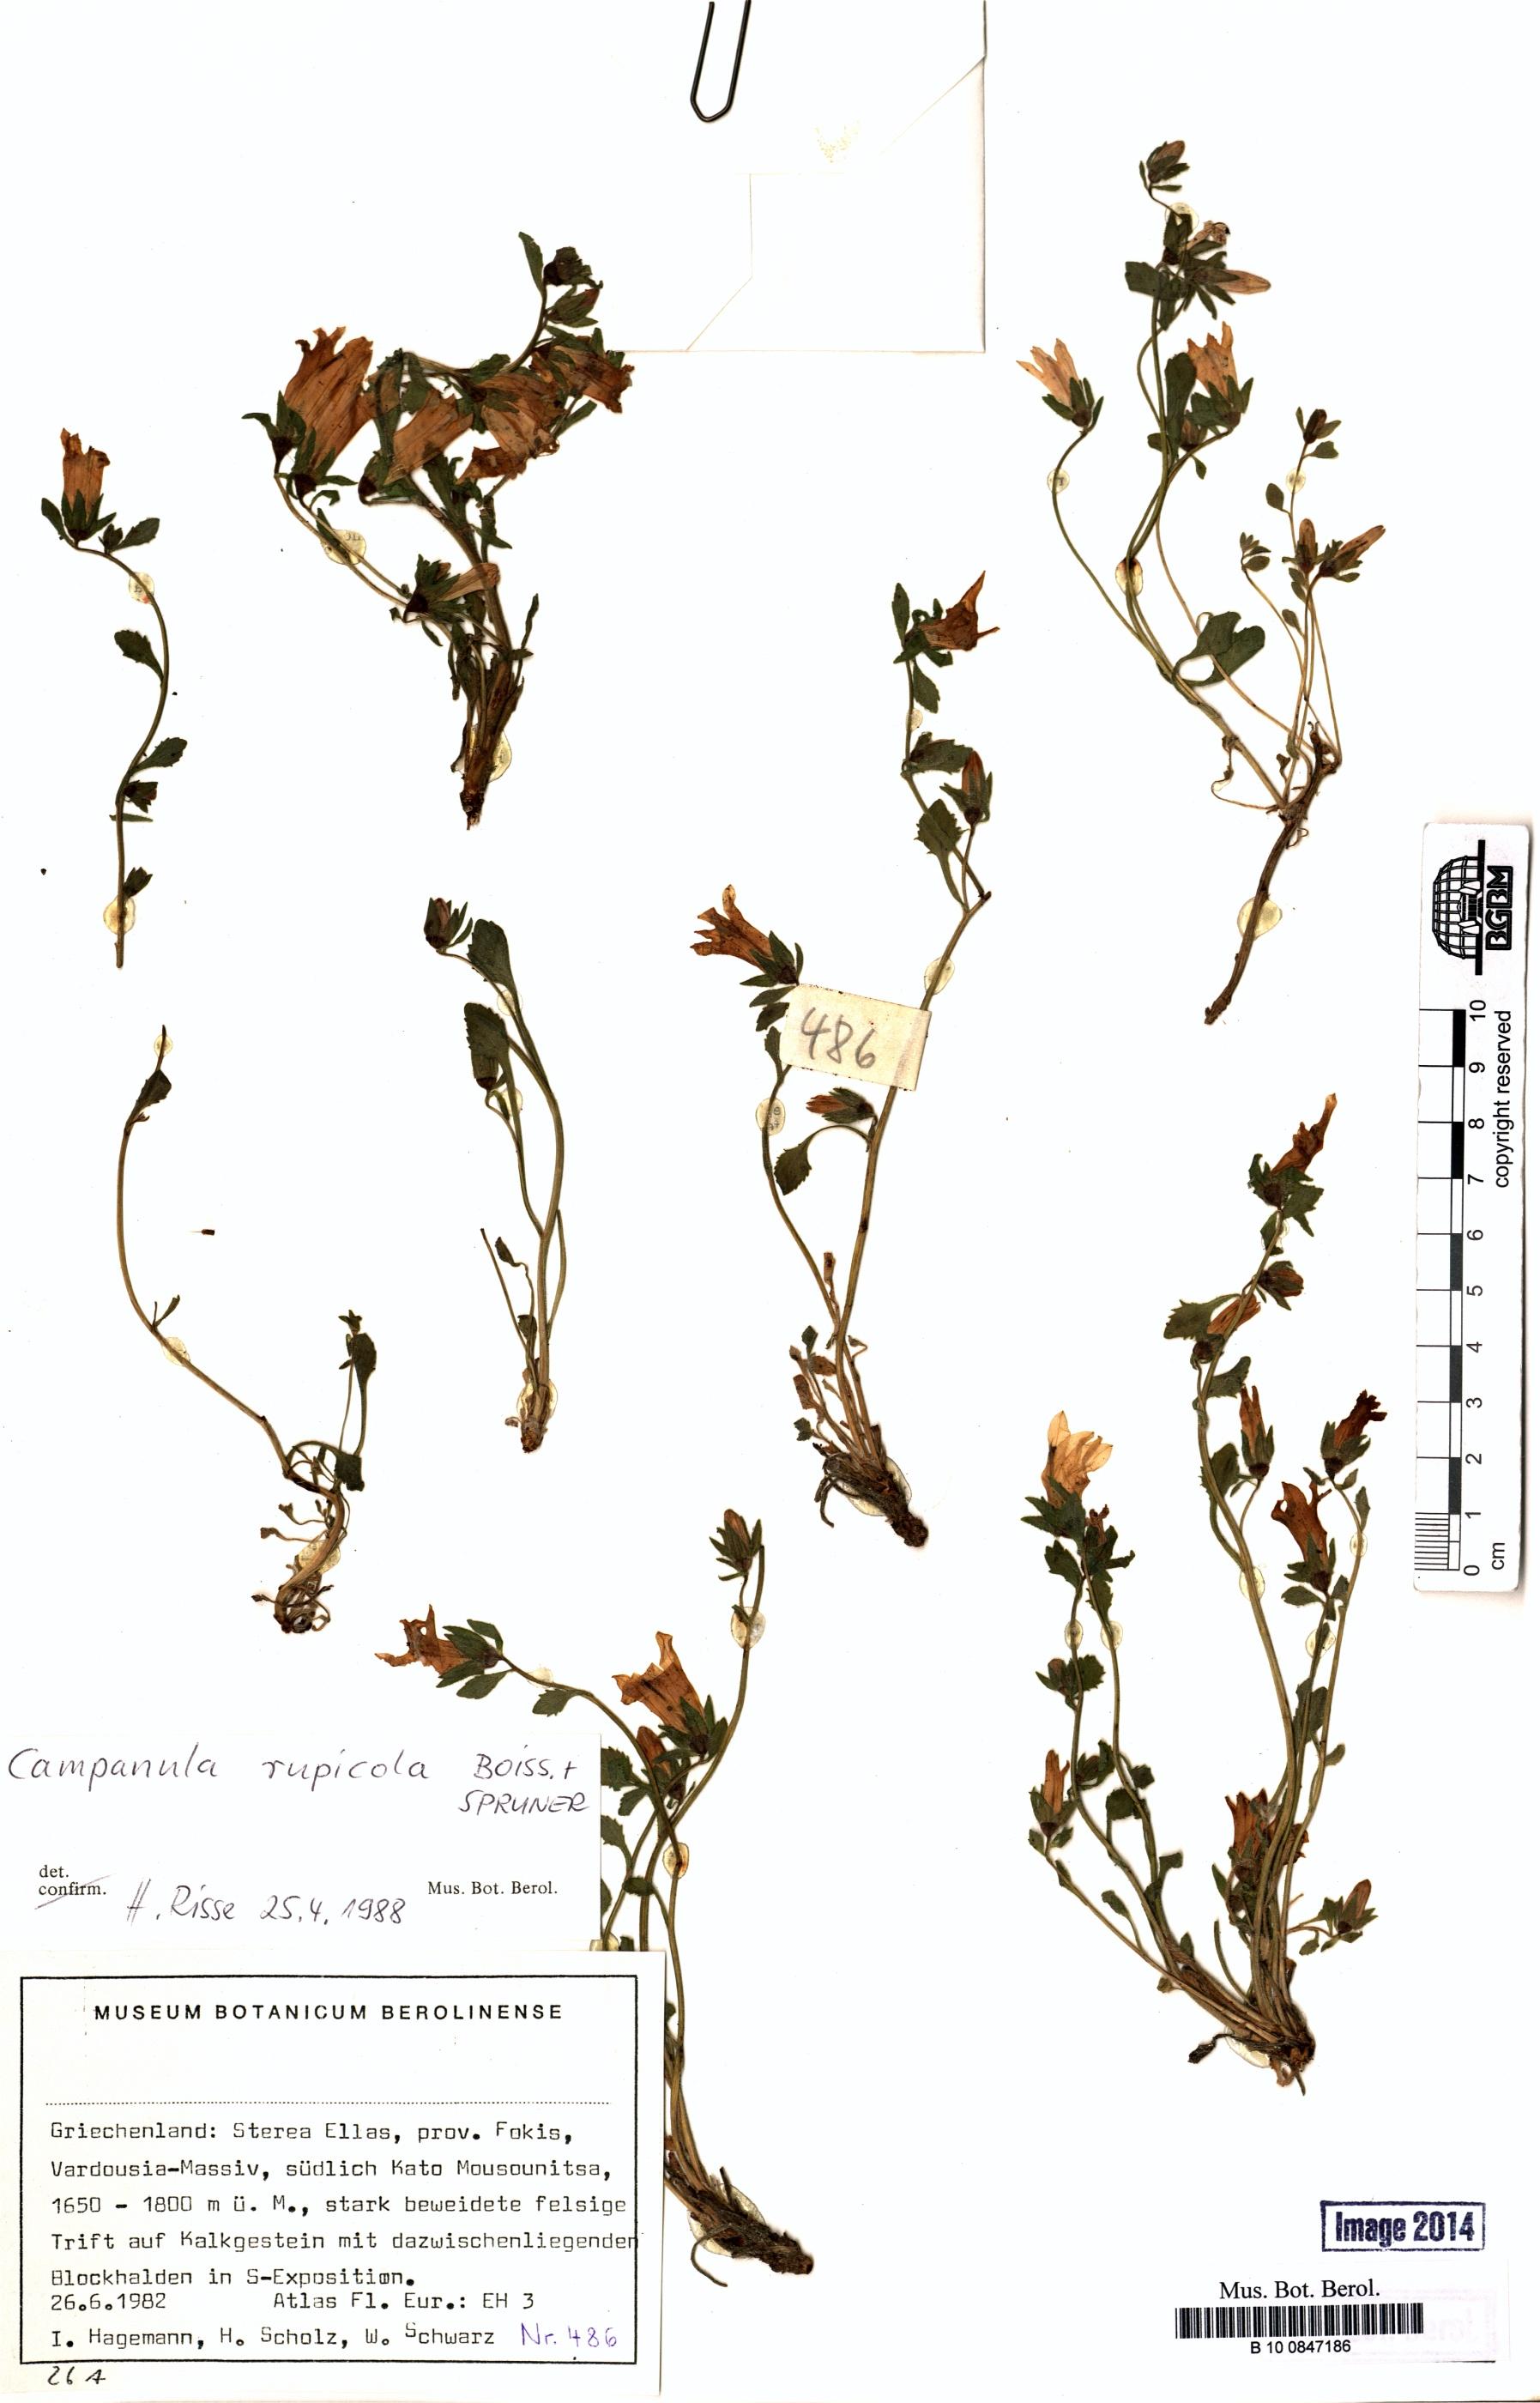 http://ww2.bgbm.org/herbarium/images/B/10/08/47/18/B_10_0847186.jpg